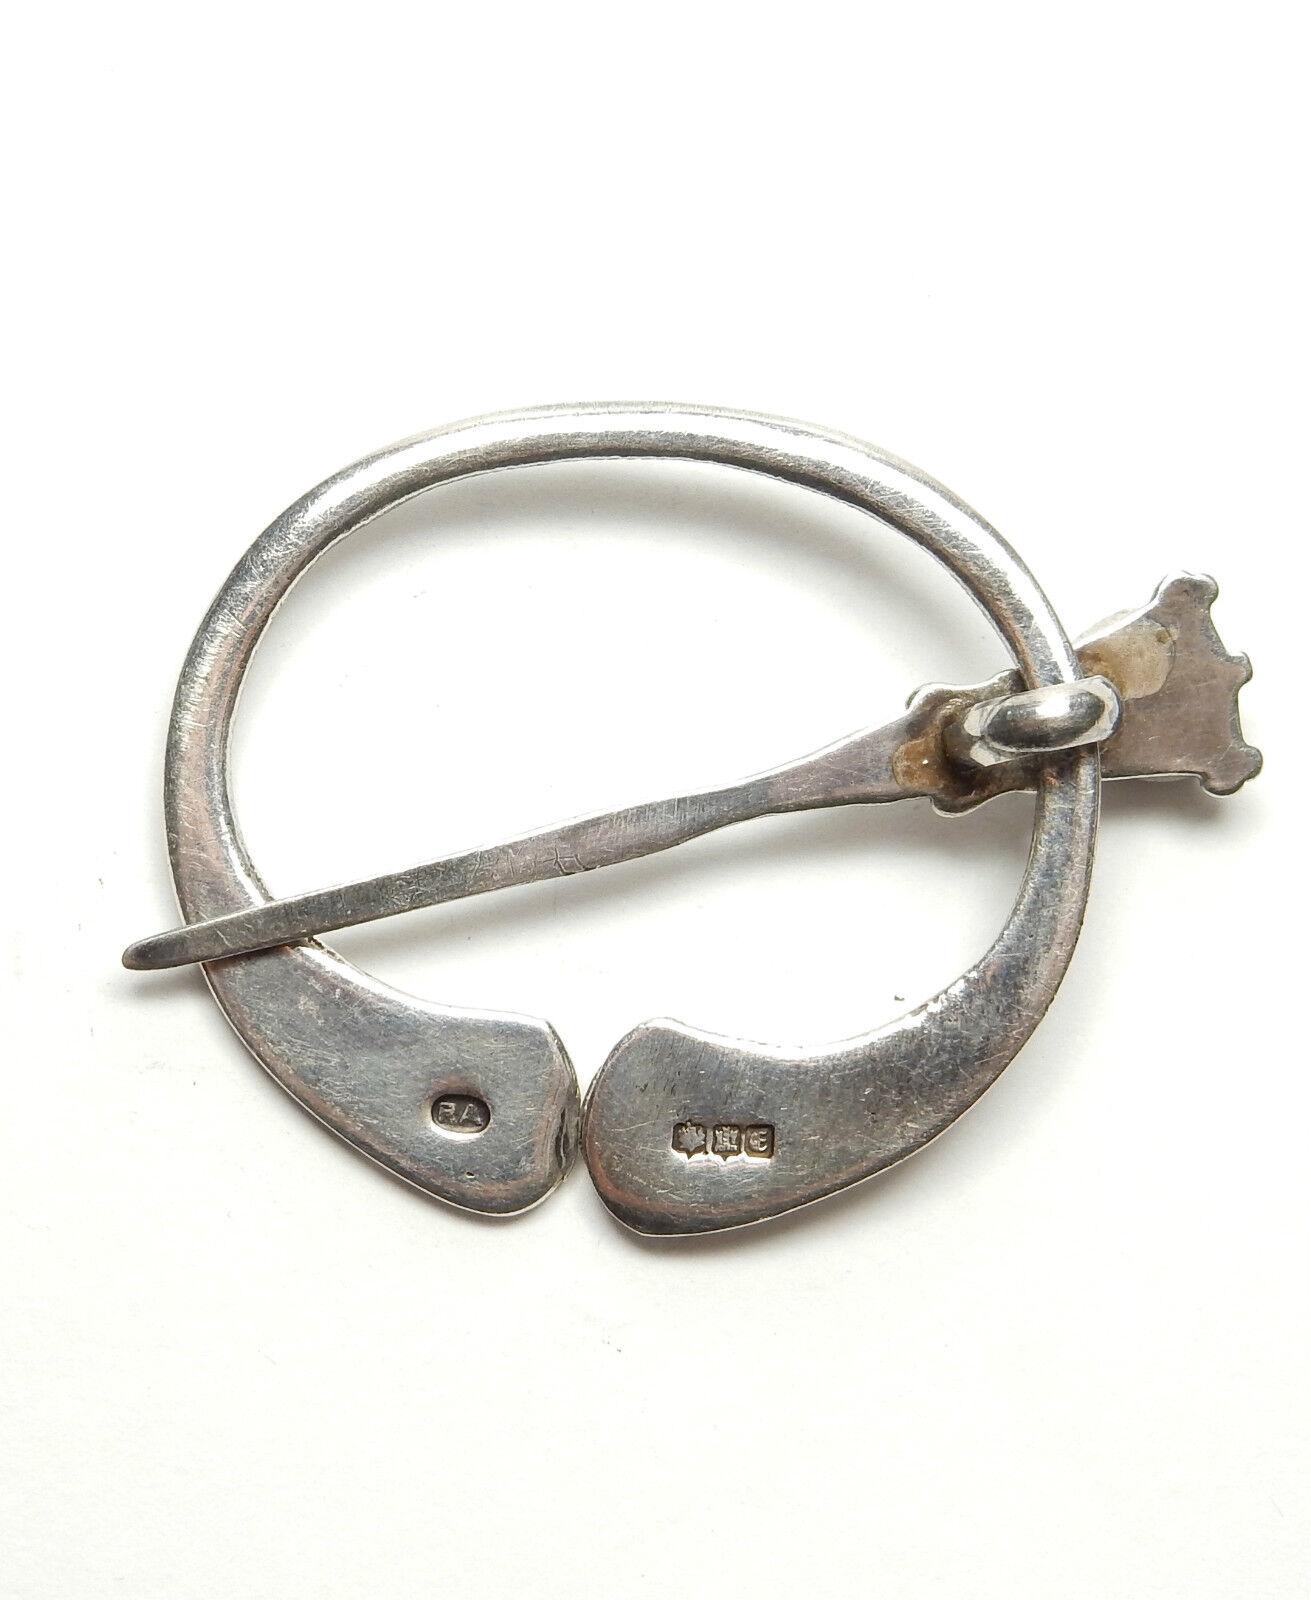 VINTAGE ROBERT Allison Kilt Kilt Kilt Pin Spilla di Edimburgo 1960 925 argentoo Sterling 9.2g 621a31